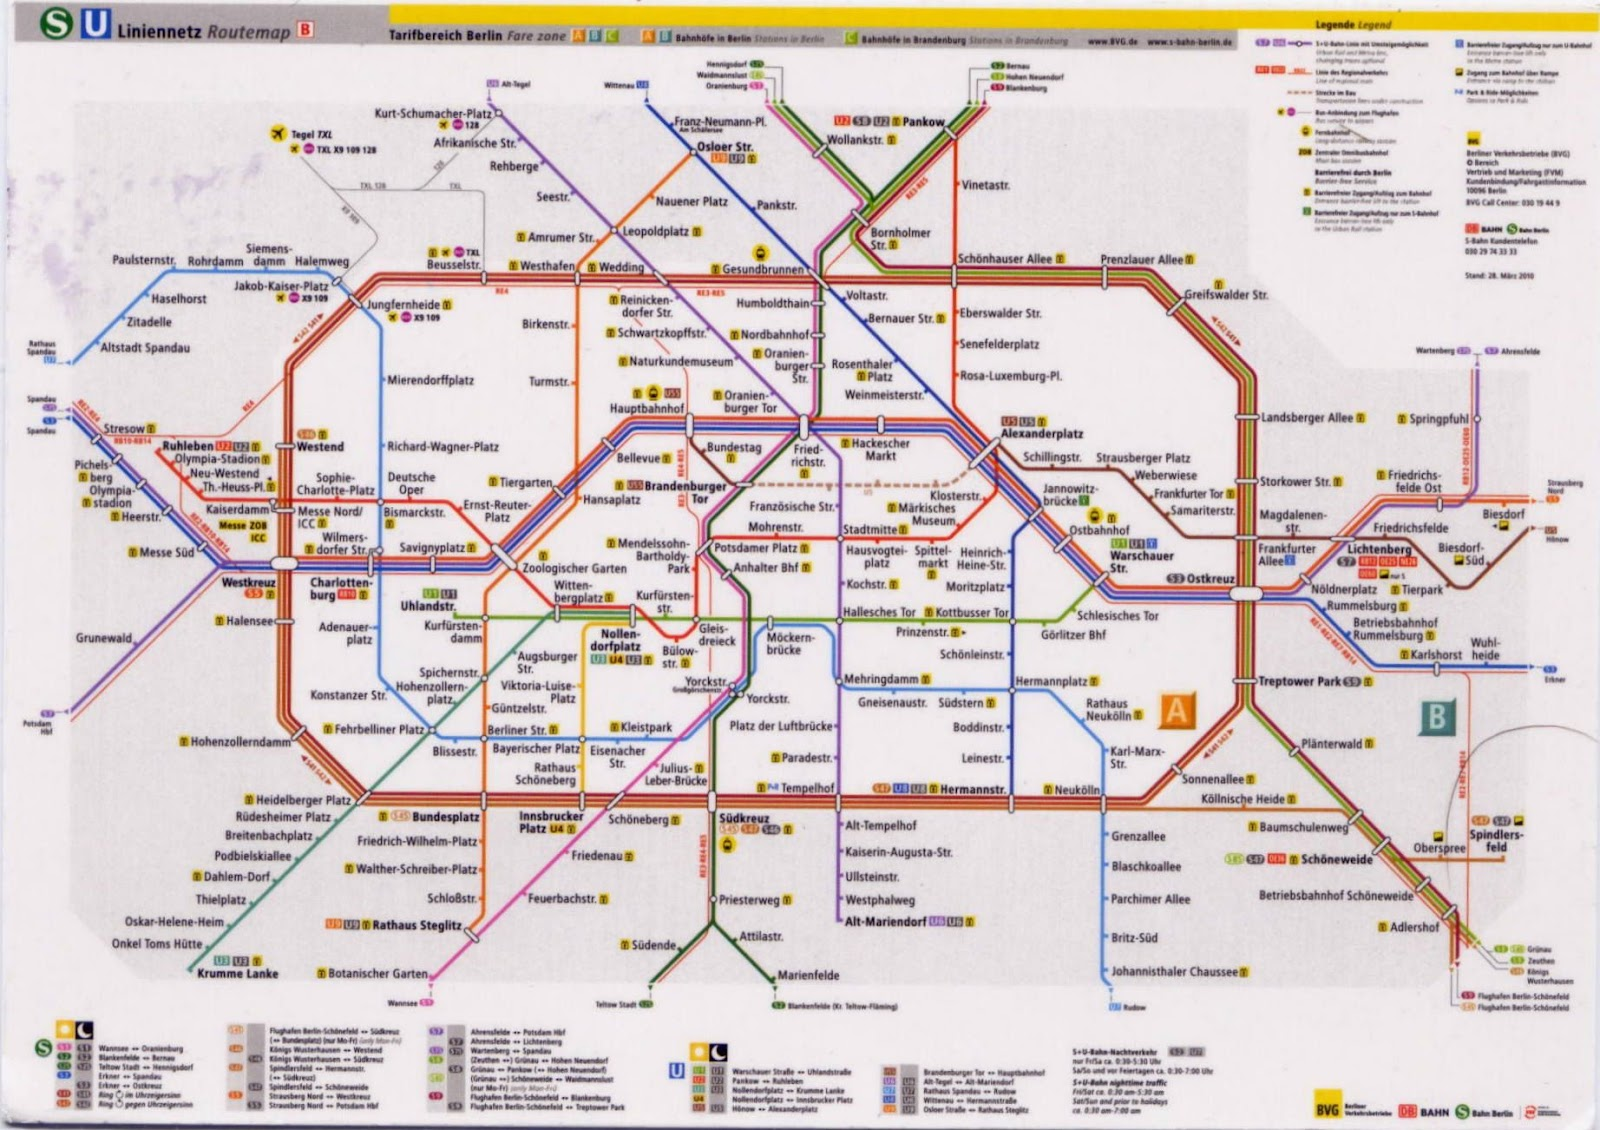 Bekannte Petites fenêtres sur le Monde: Berlin U-Bahn LF51